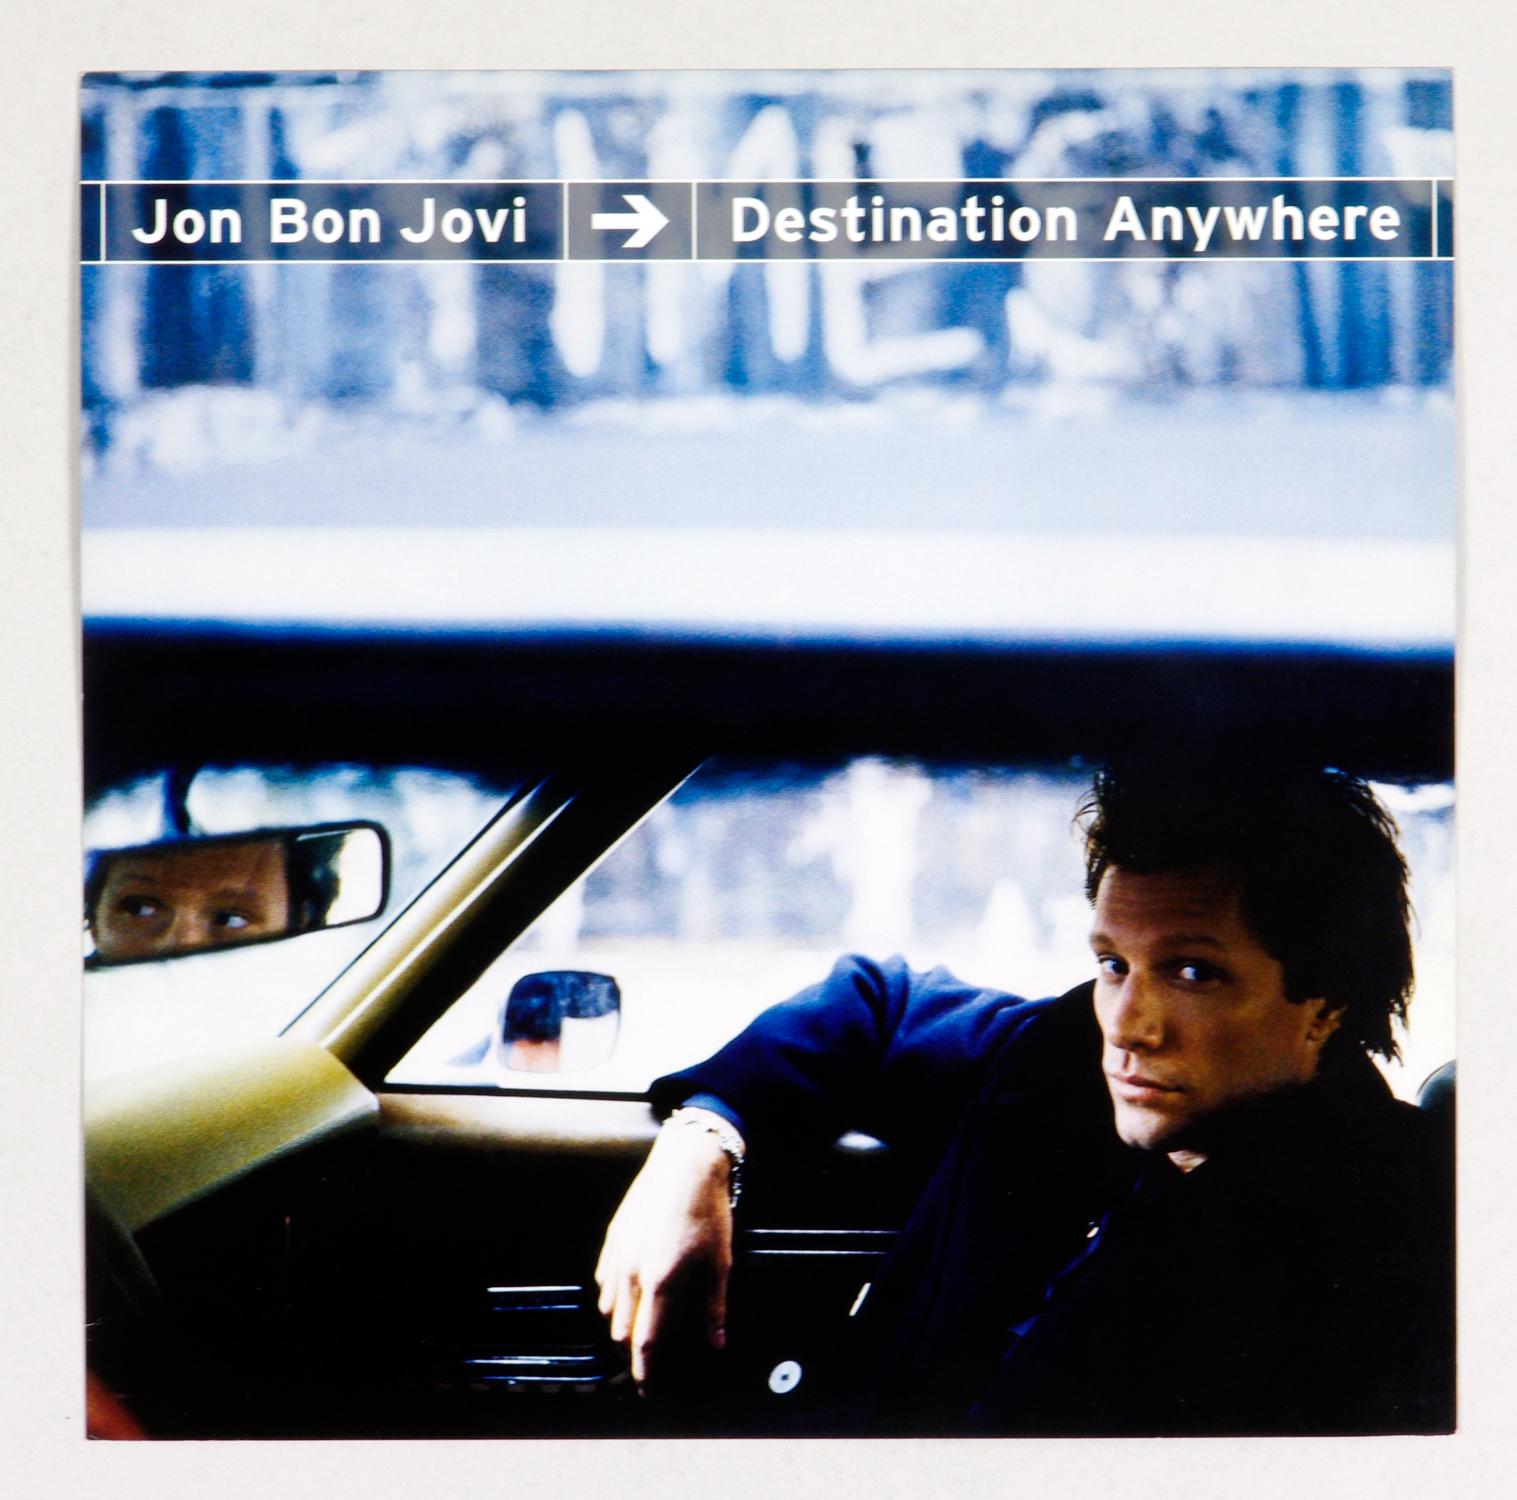 Jon Bon Jovi Poster Flat 1997 Destination Anywhere Album Promotion 12 x 12